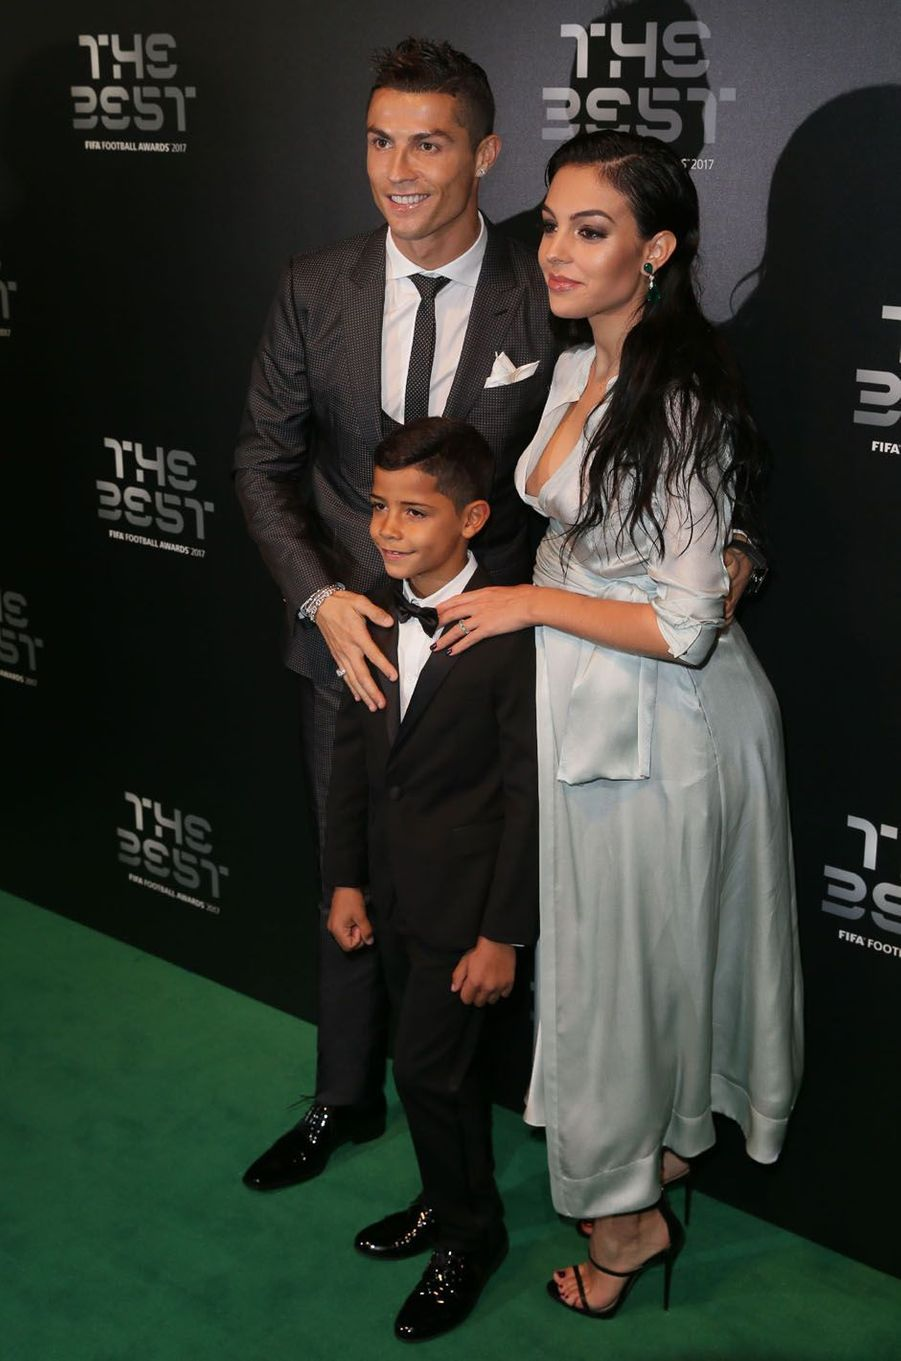 Cristiano Ronaldo, Georgina Rodriguez et Cristiano Junior à la cérémonie des Best Fifa Football Awards à Londres, le 23 octobre 2017.